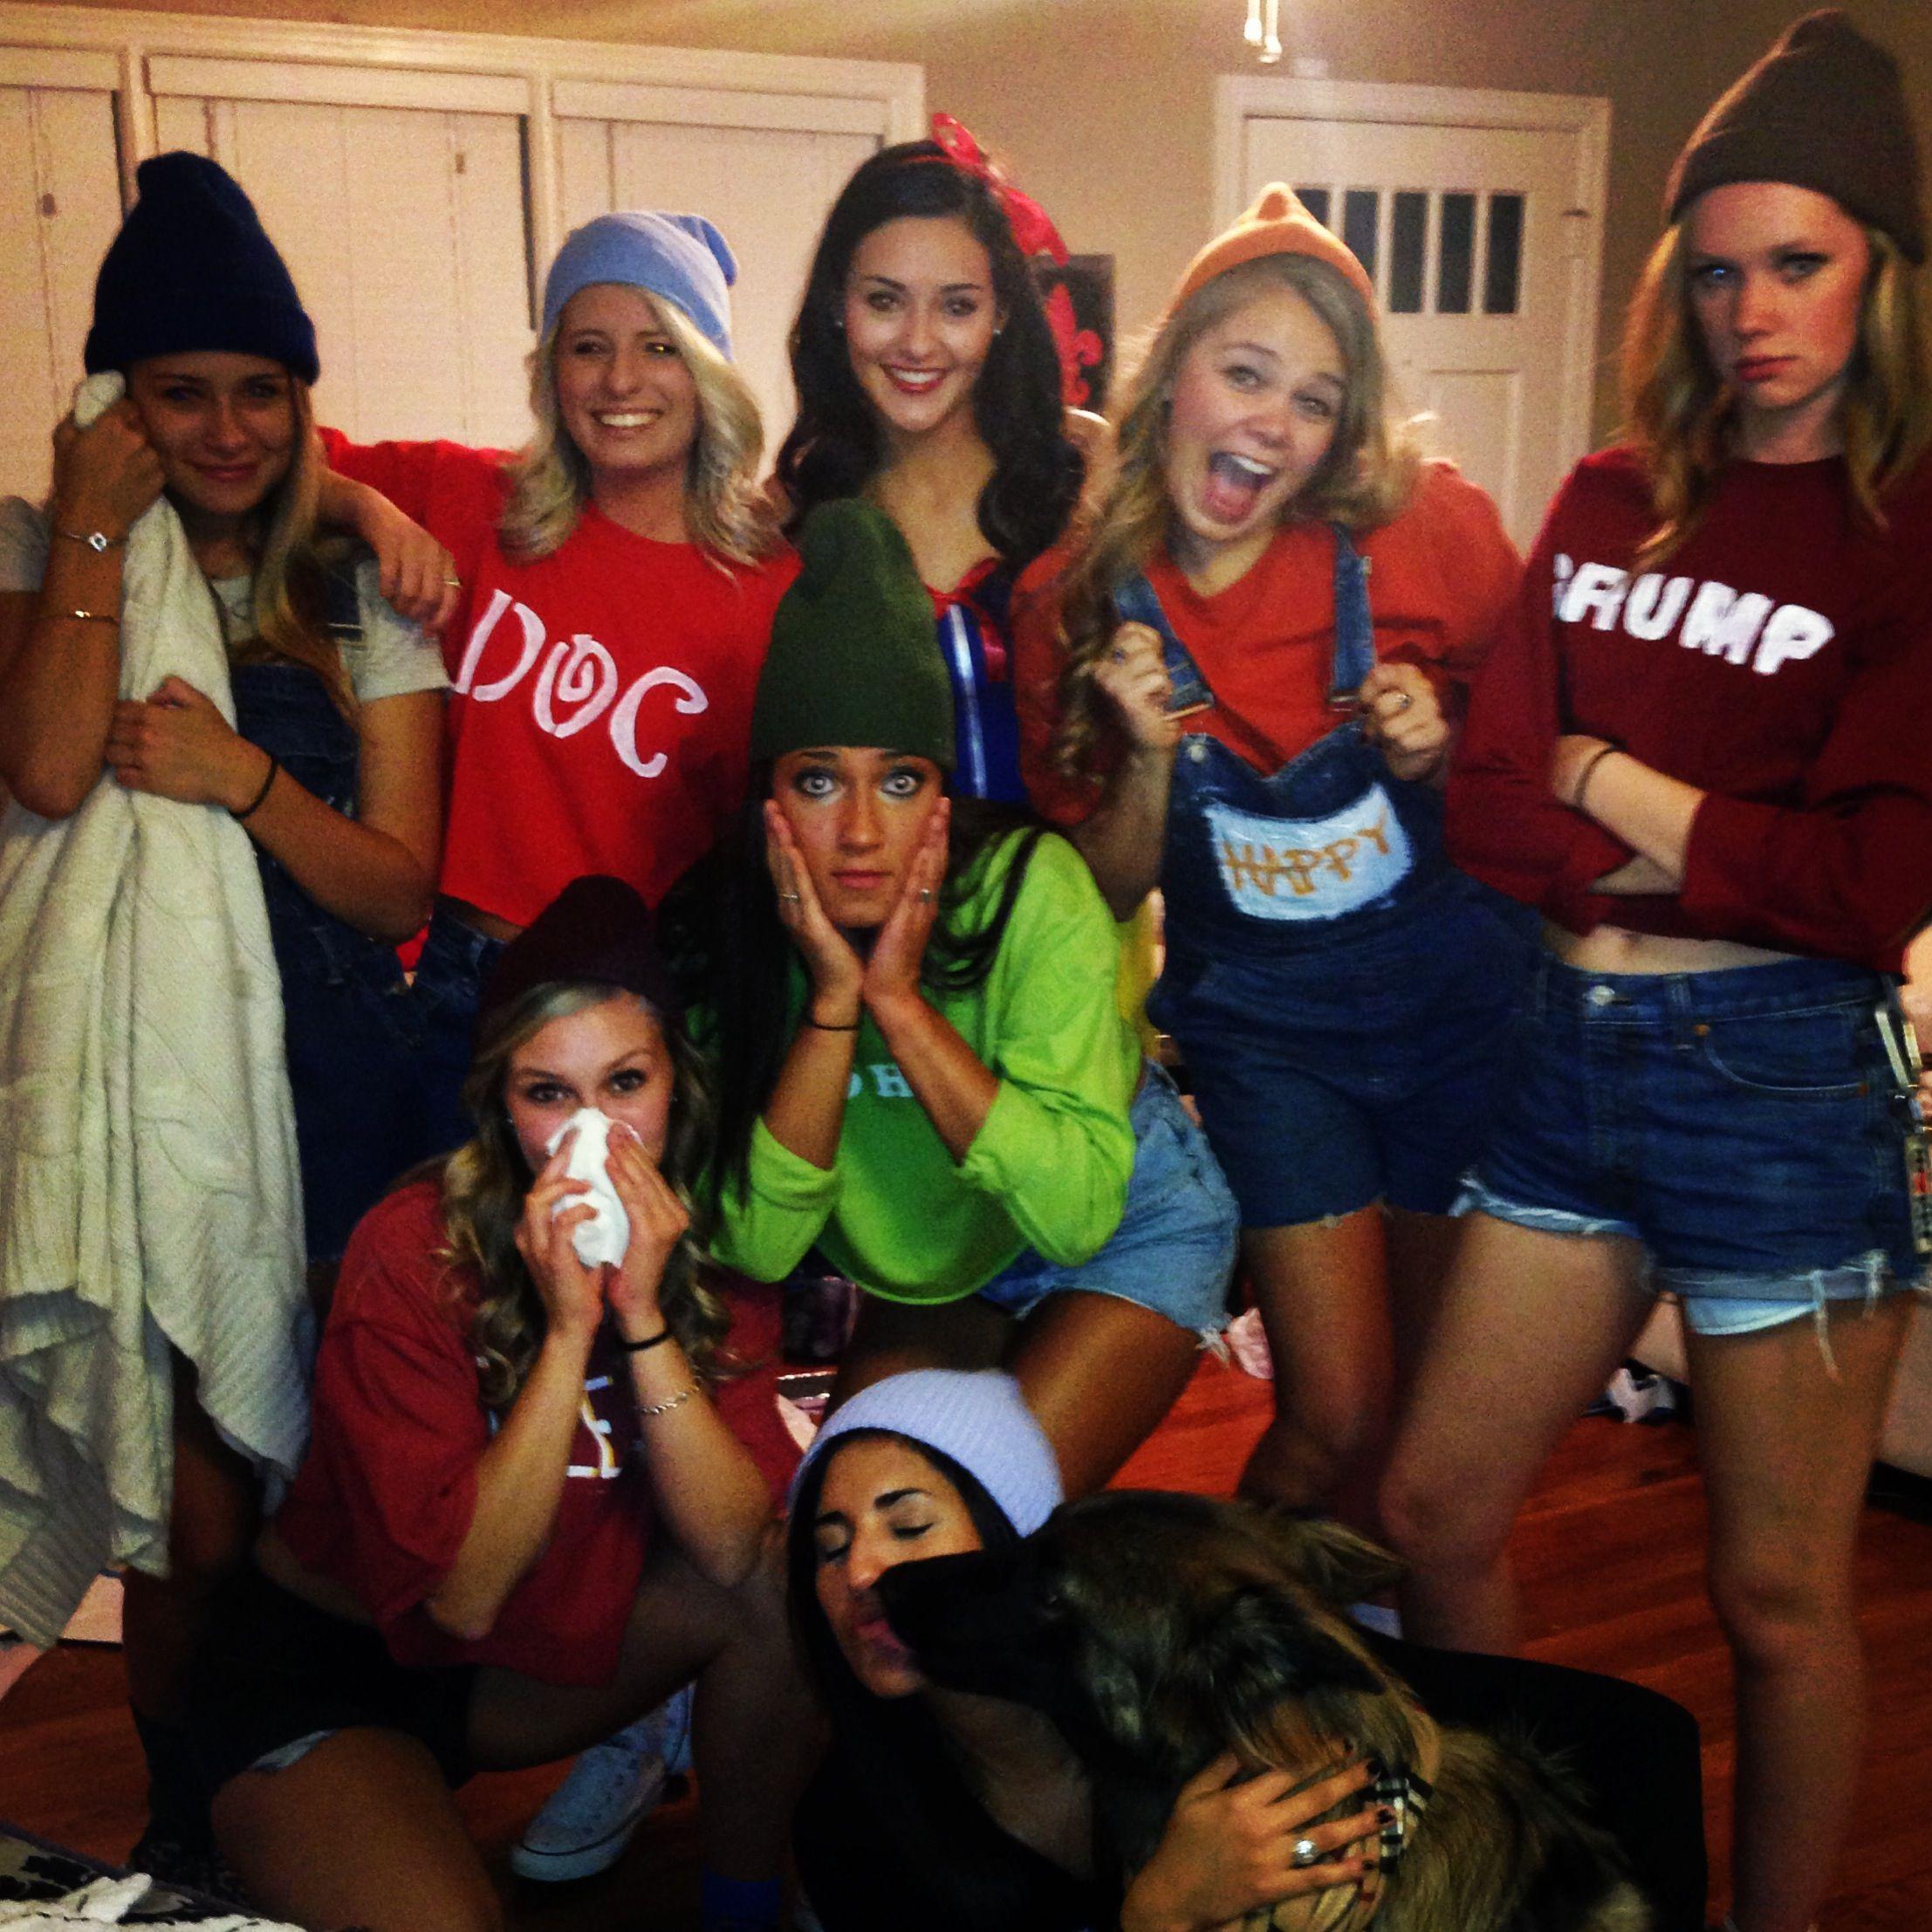 Snow White and the seven dwarfs   Vintage/Costumes   Pinterest ...